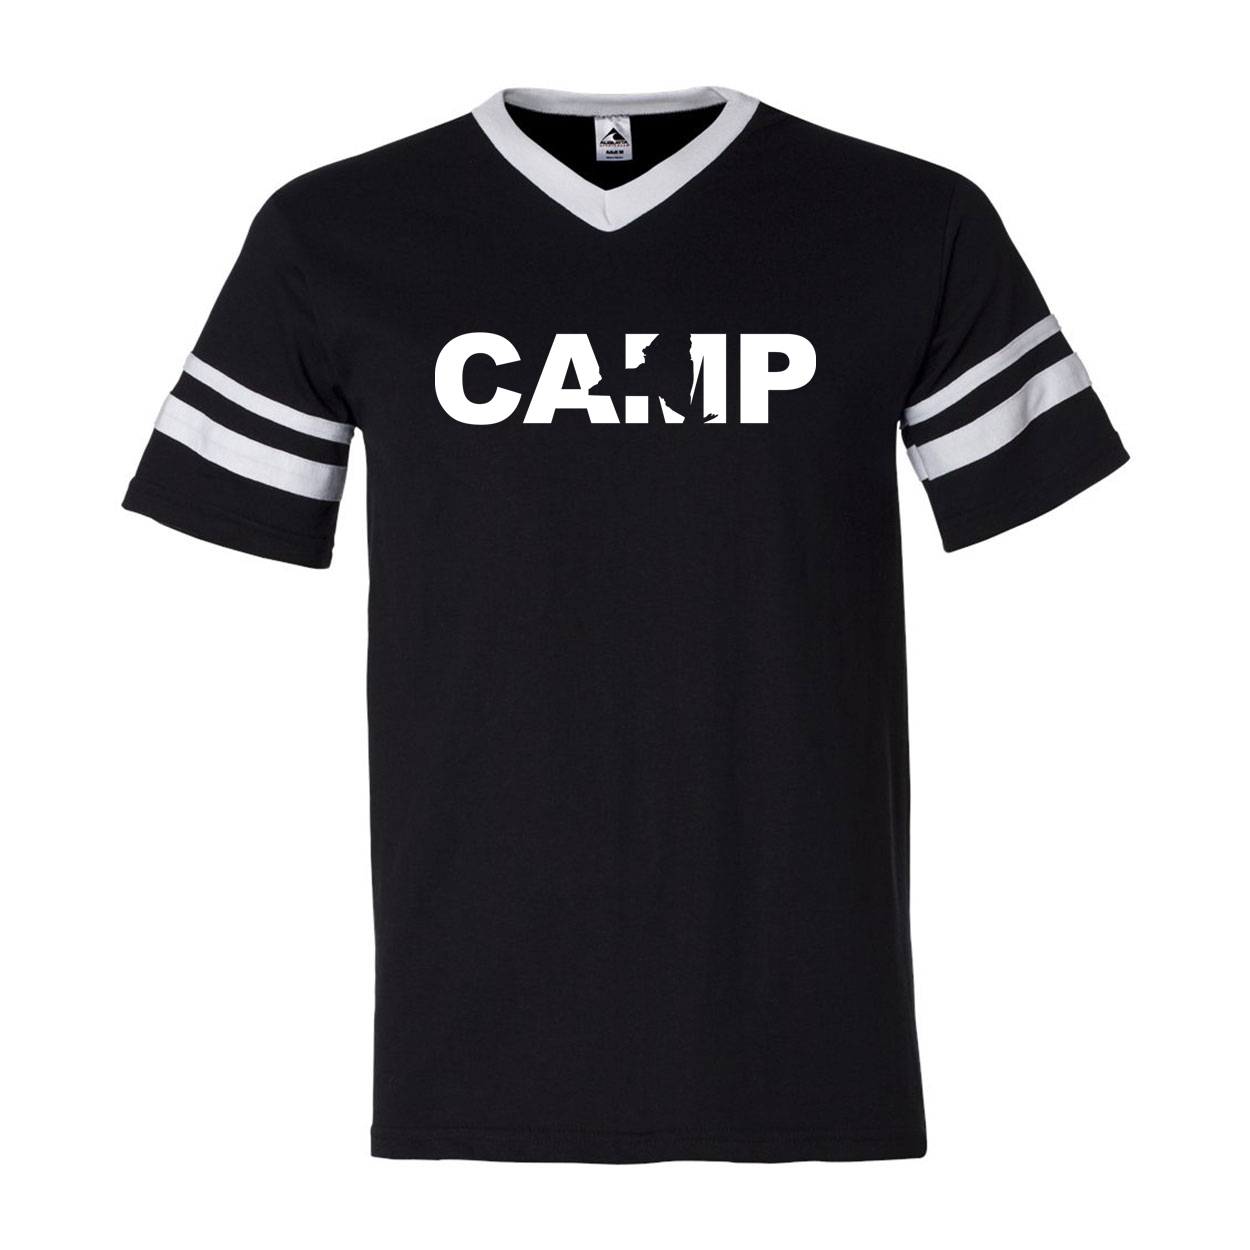 Camp New York Classic Premium Striped Jersey T-Shirt Black/White (White Logo)